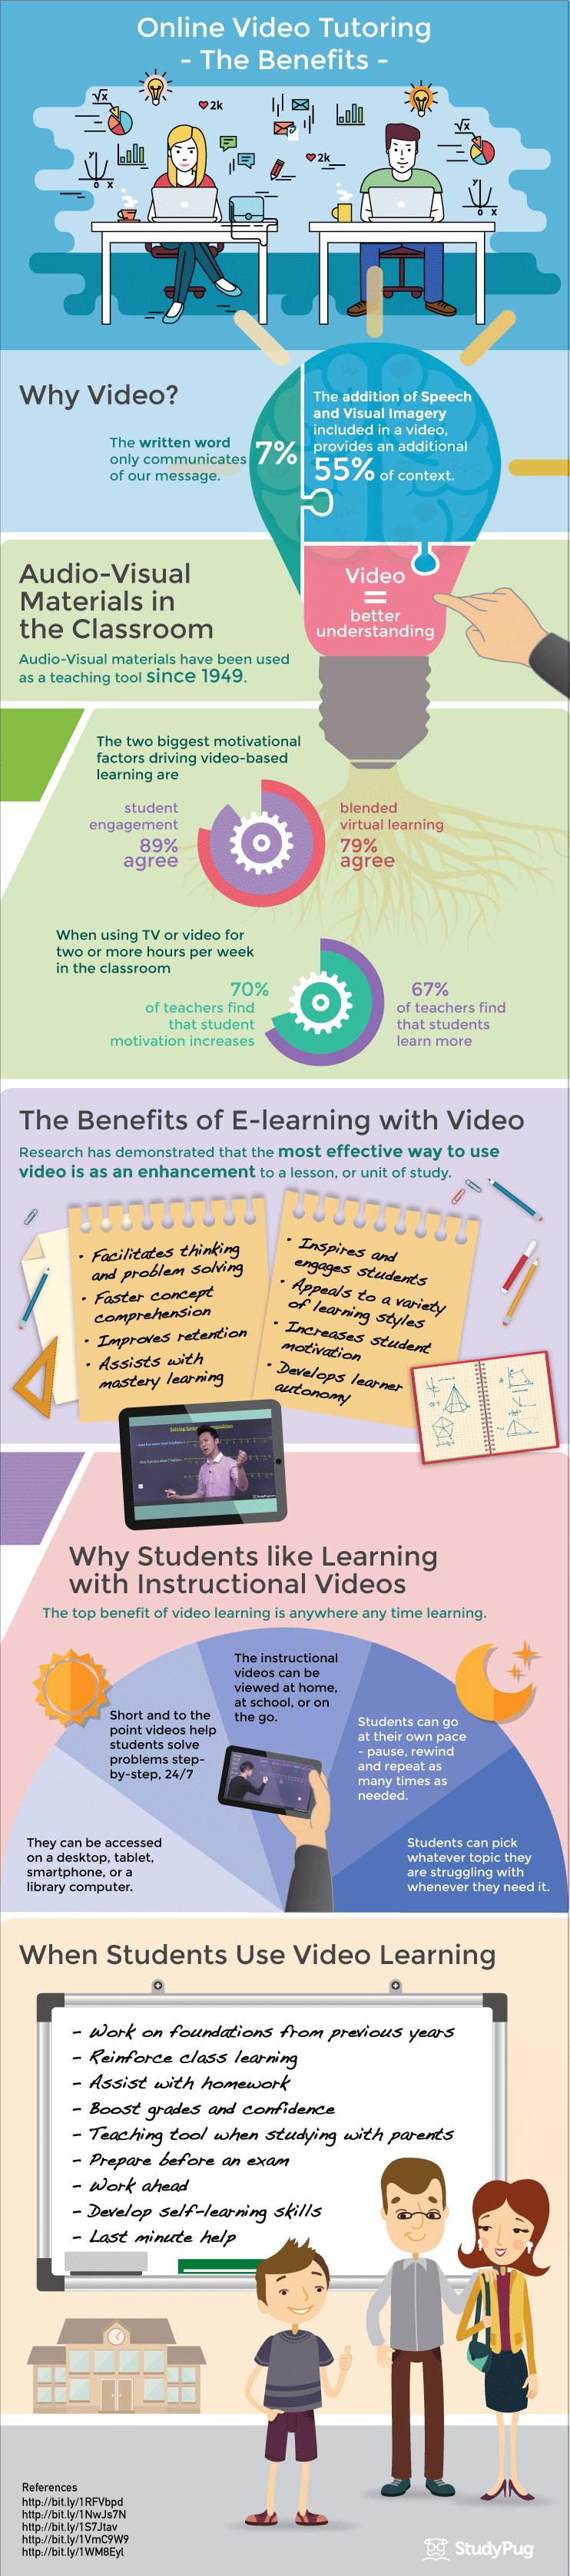 online-video-tutoring